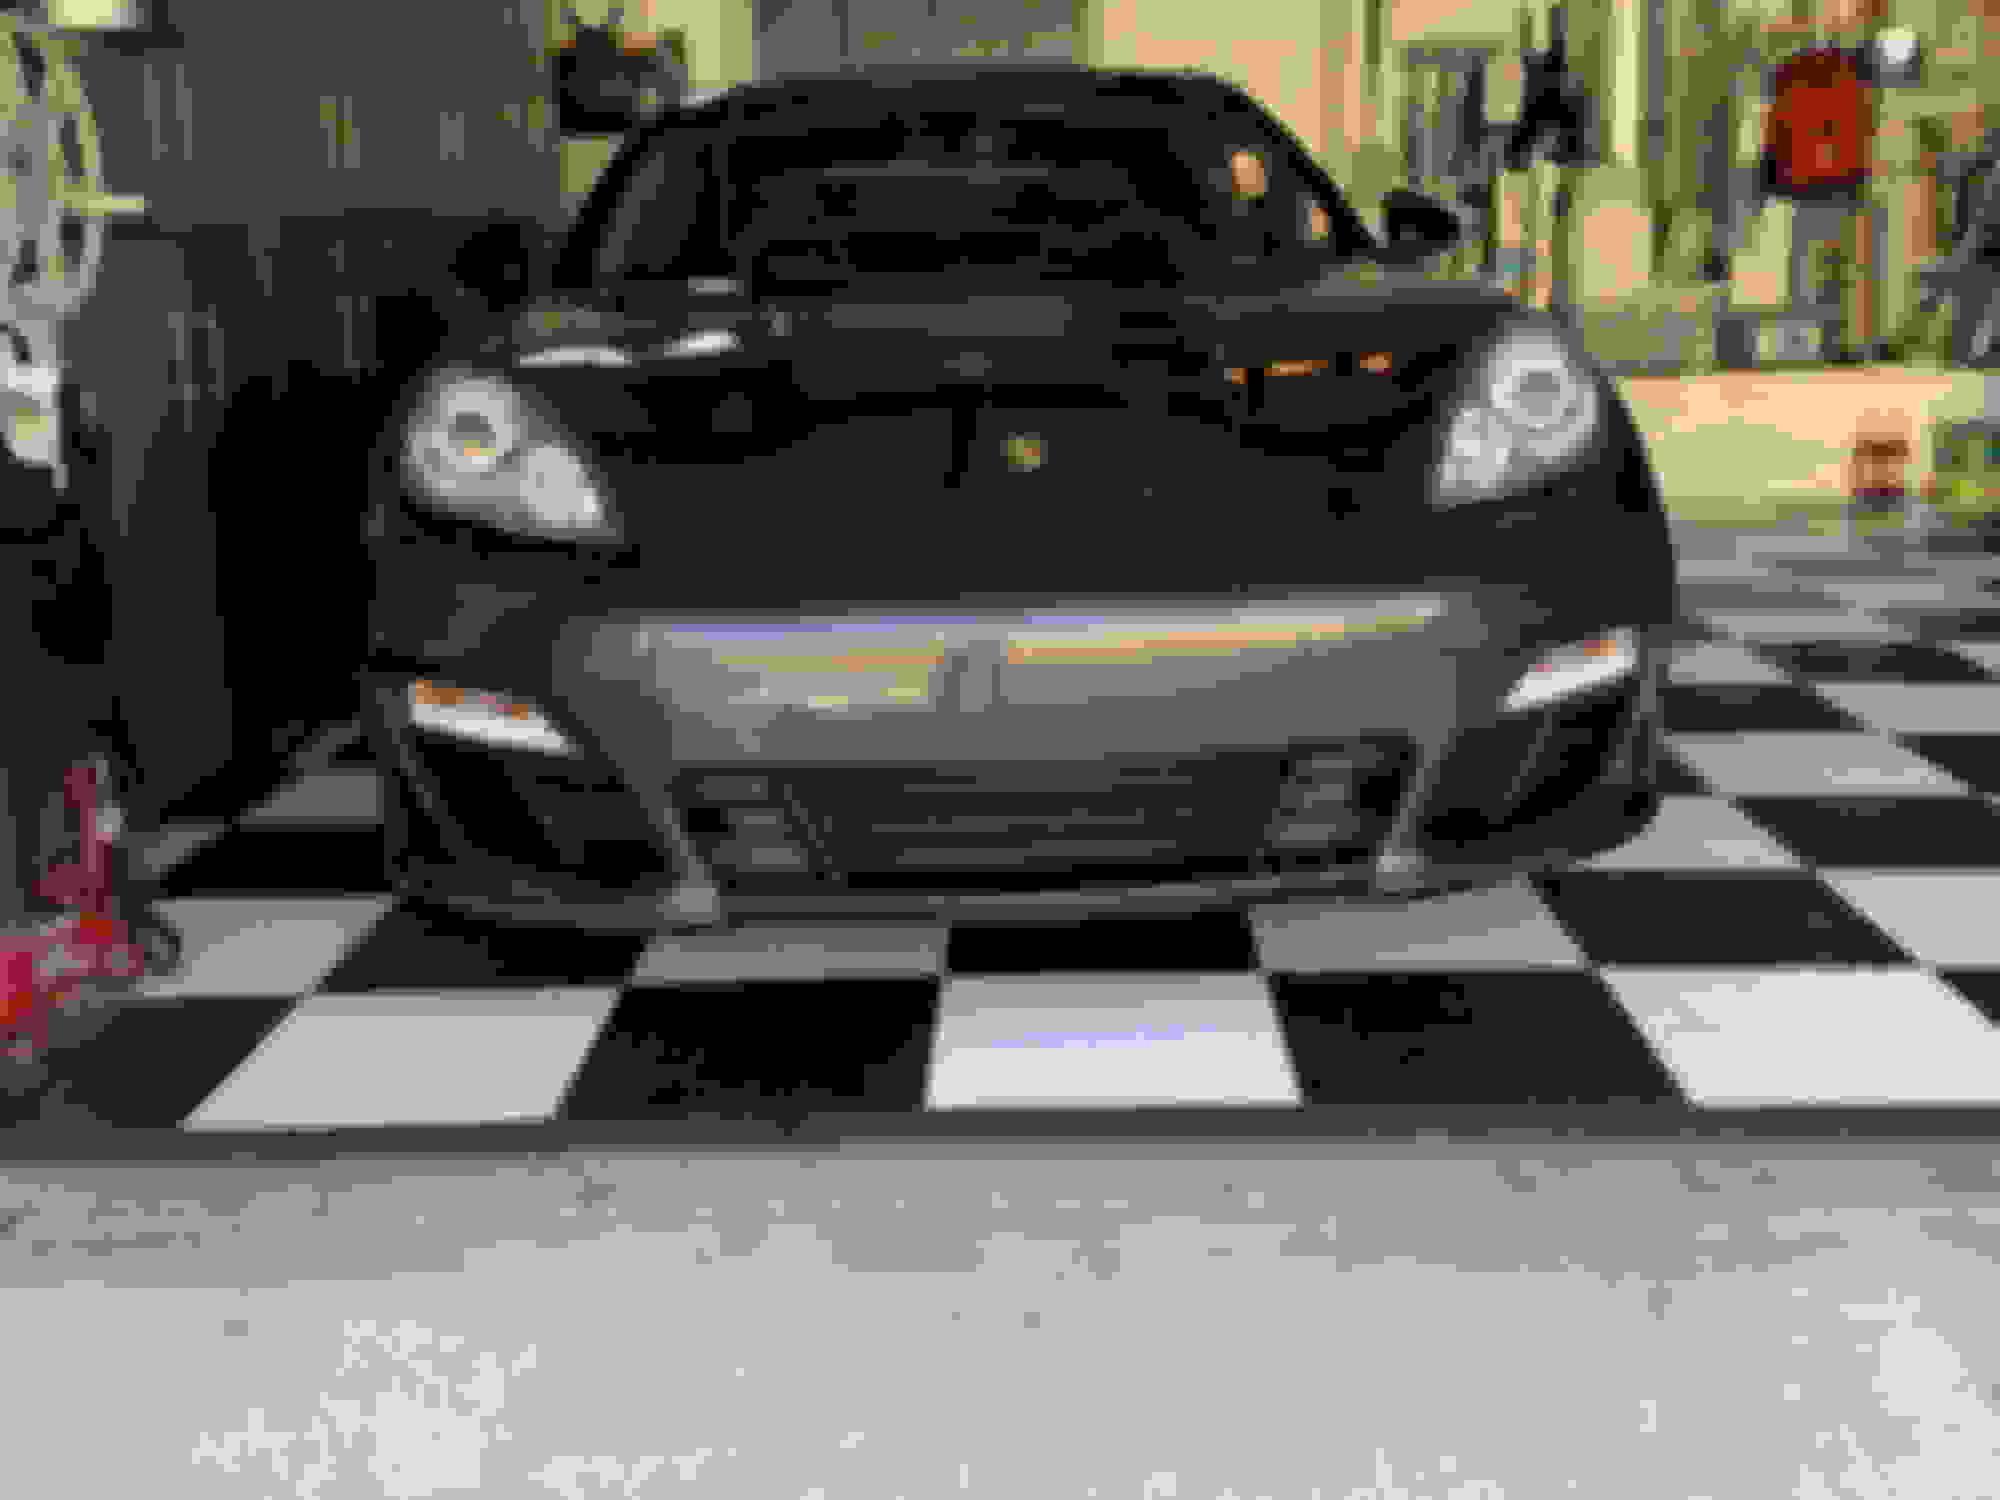 Ideas for grille mesh on a turbo - 6SpeedOnline - Porsche